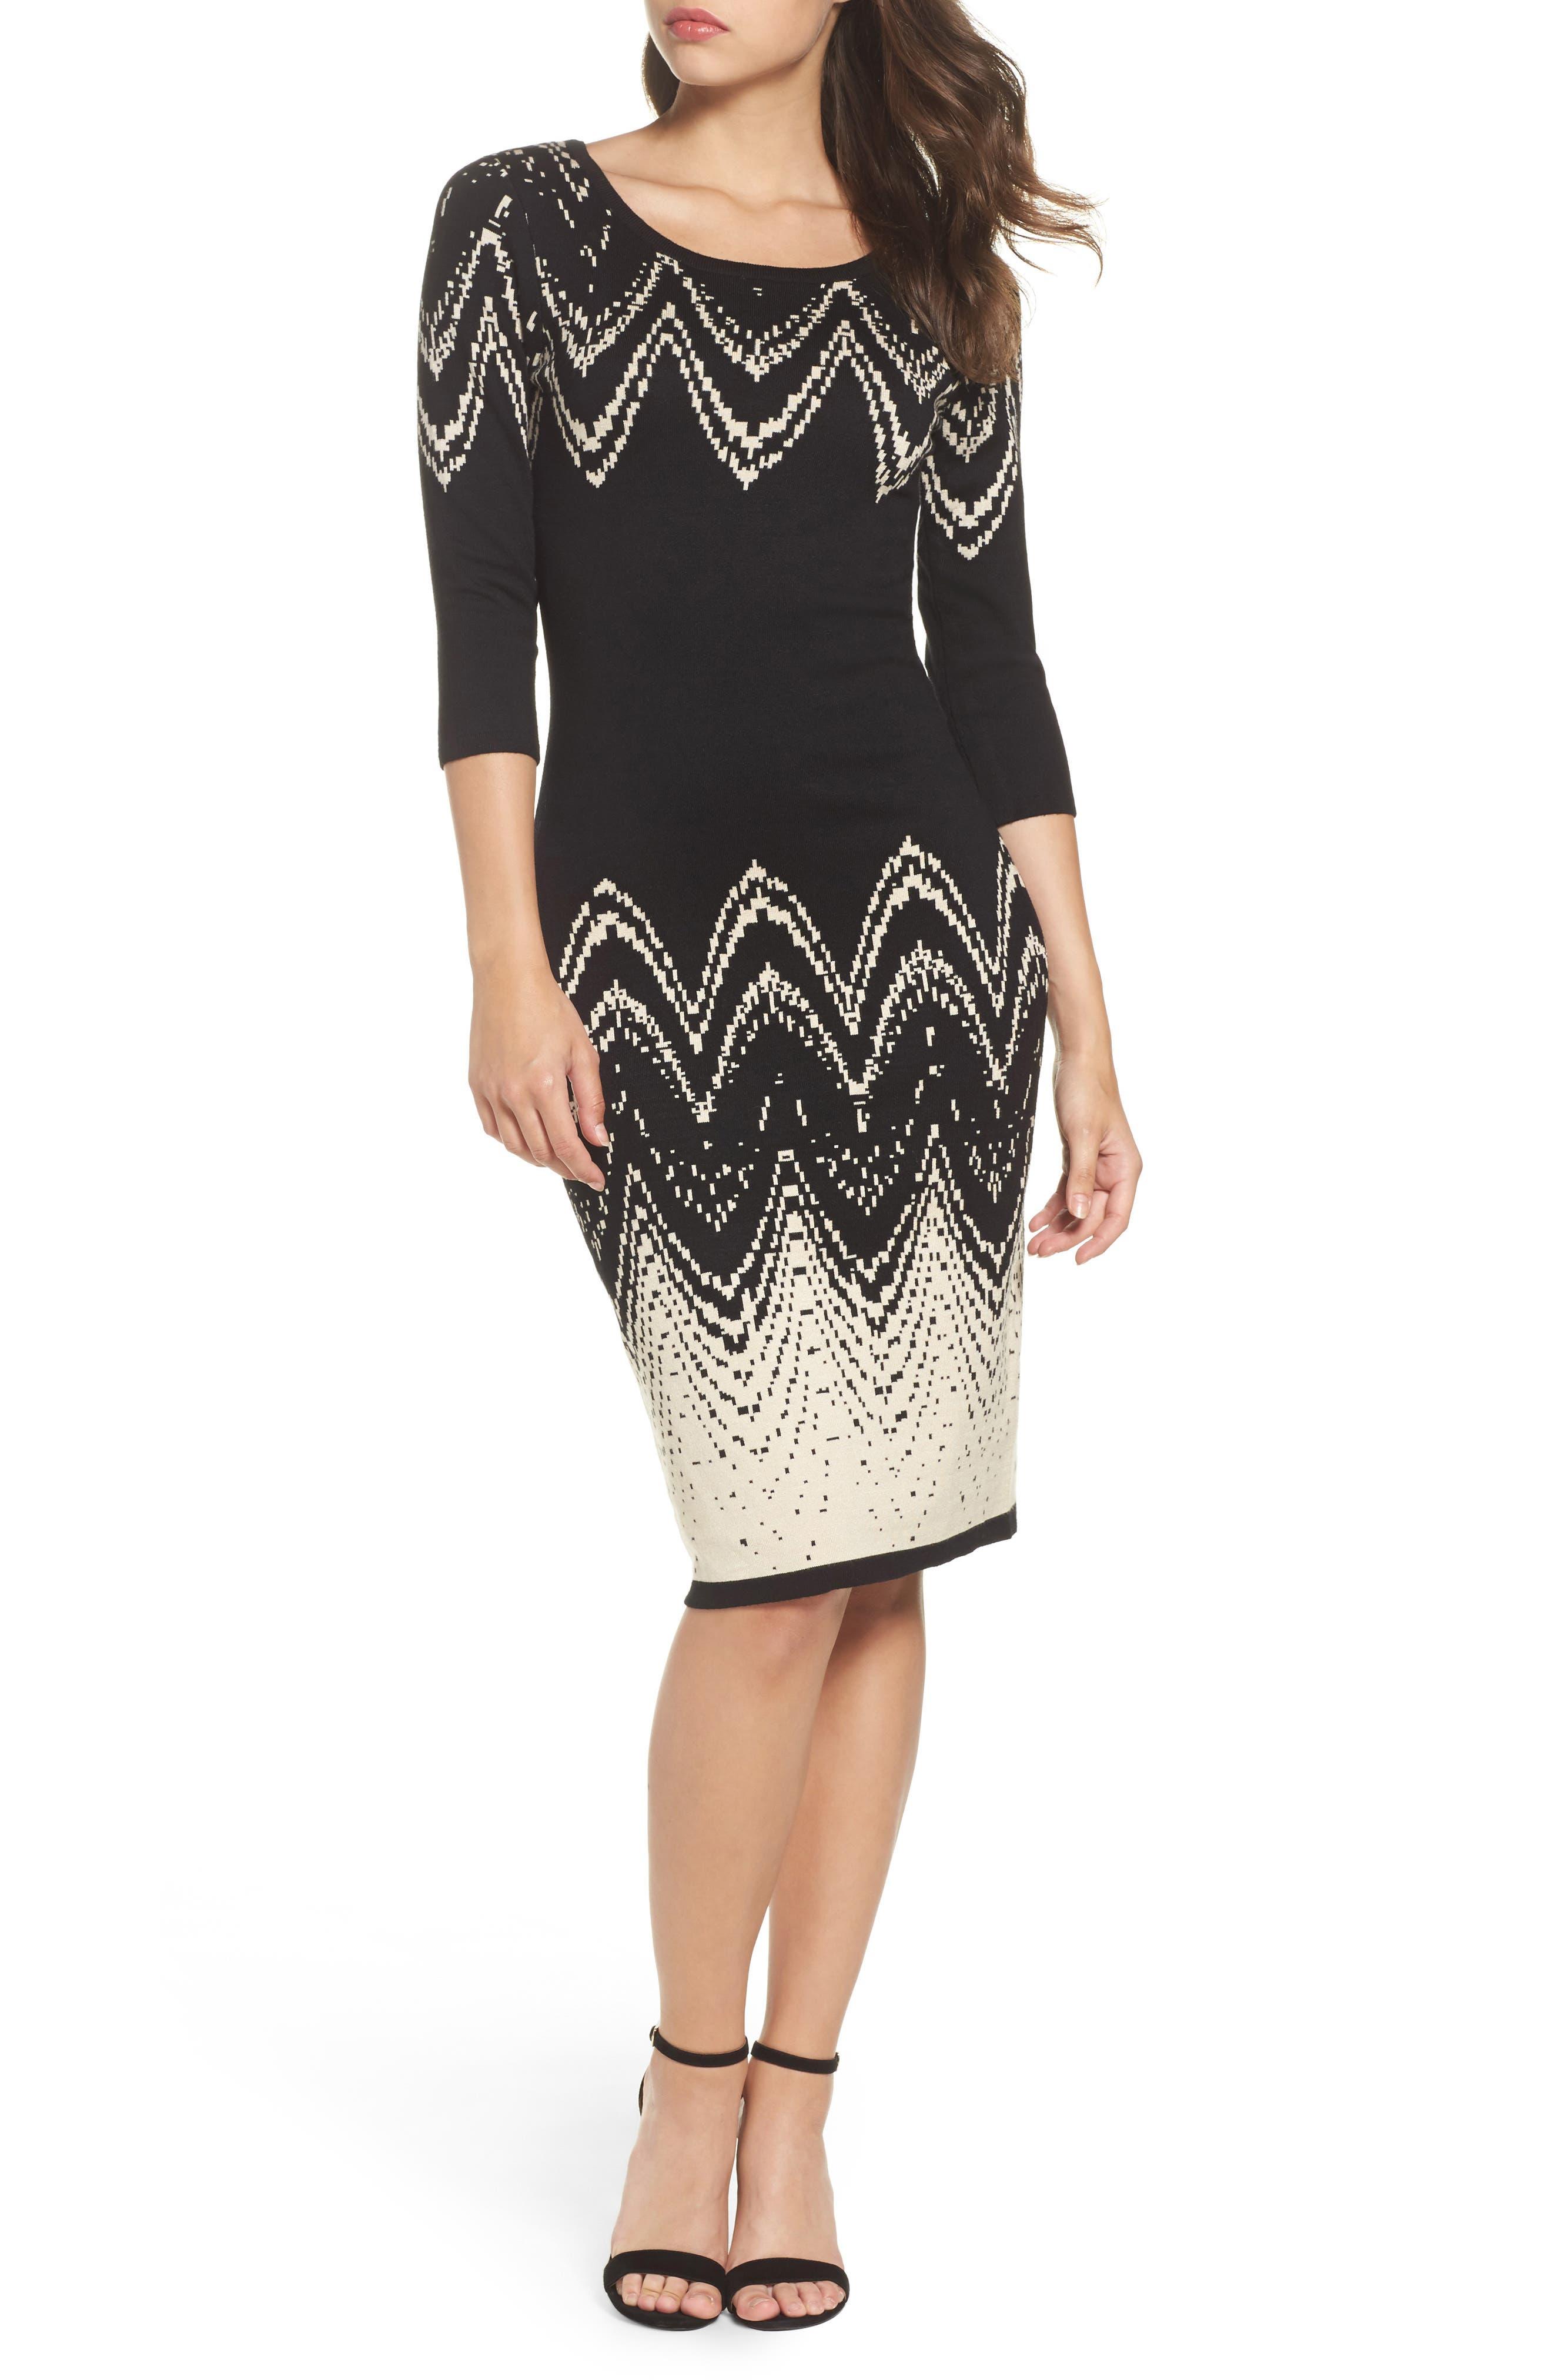 Alternate Image 1 Selected - Gabby Skye Print Sweater Dress